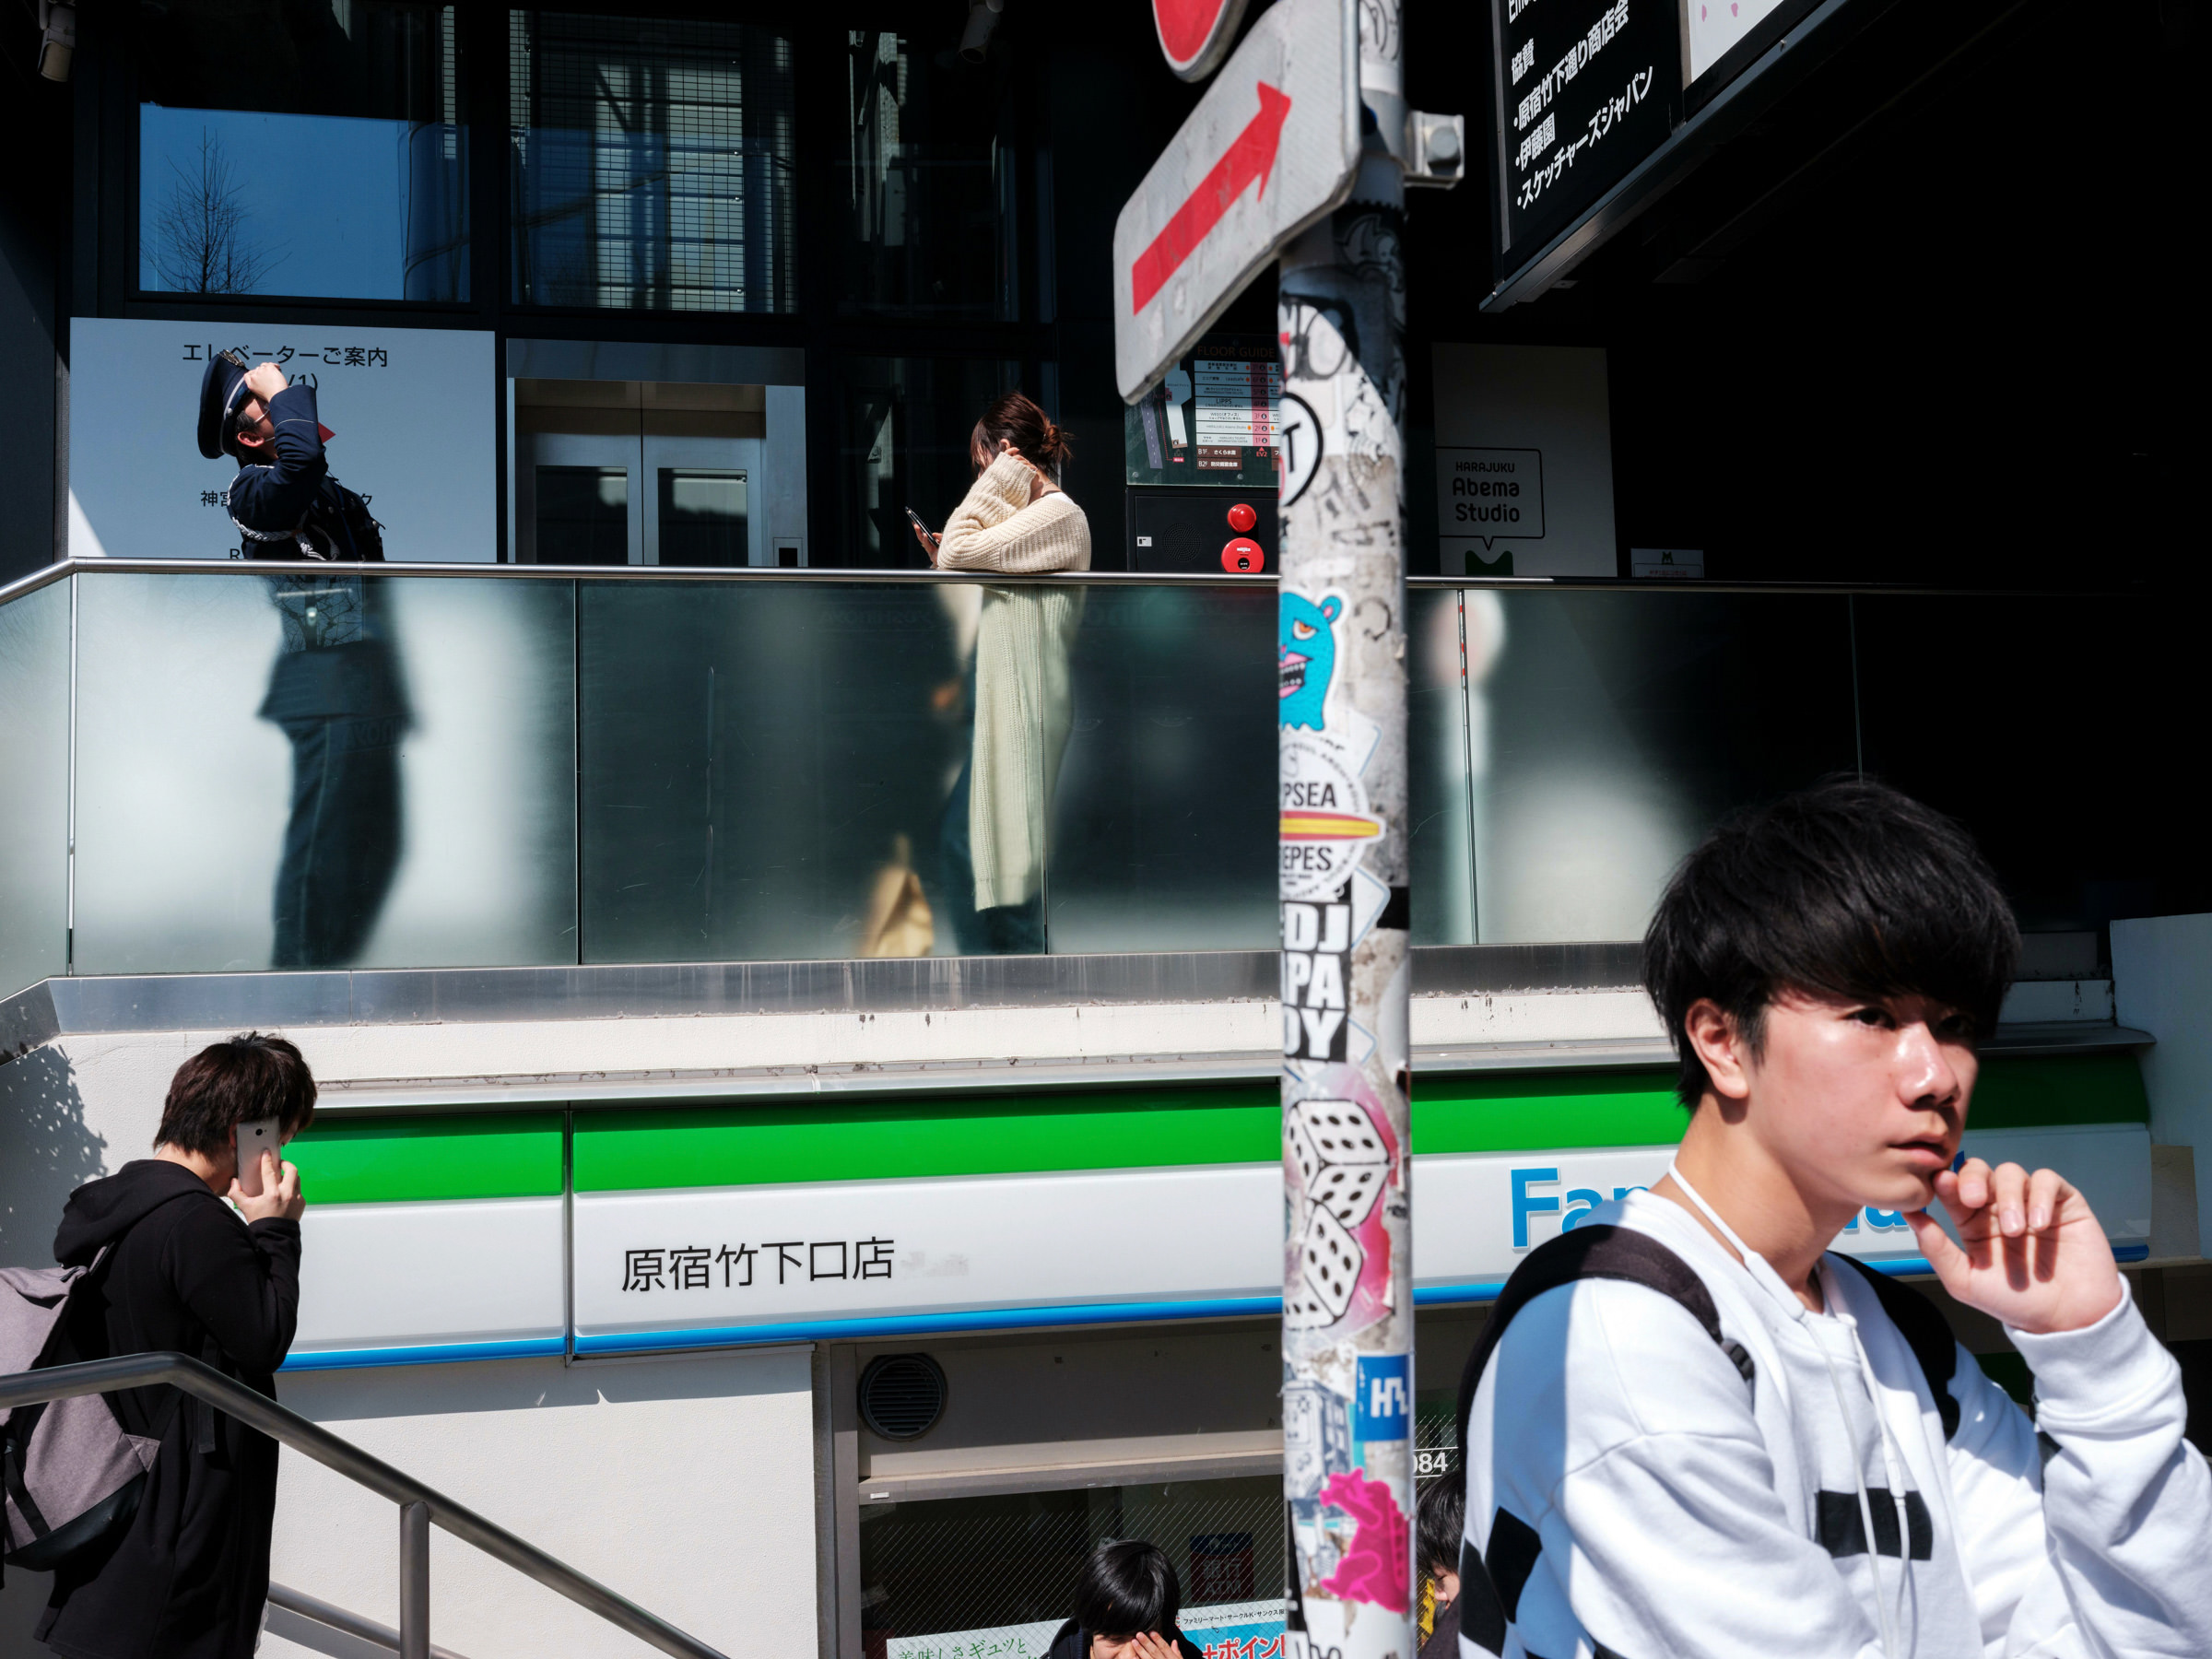 Fujifilm-GFX-Japan-Street-Photography-3